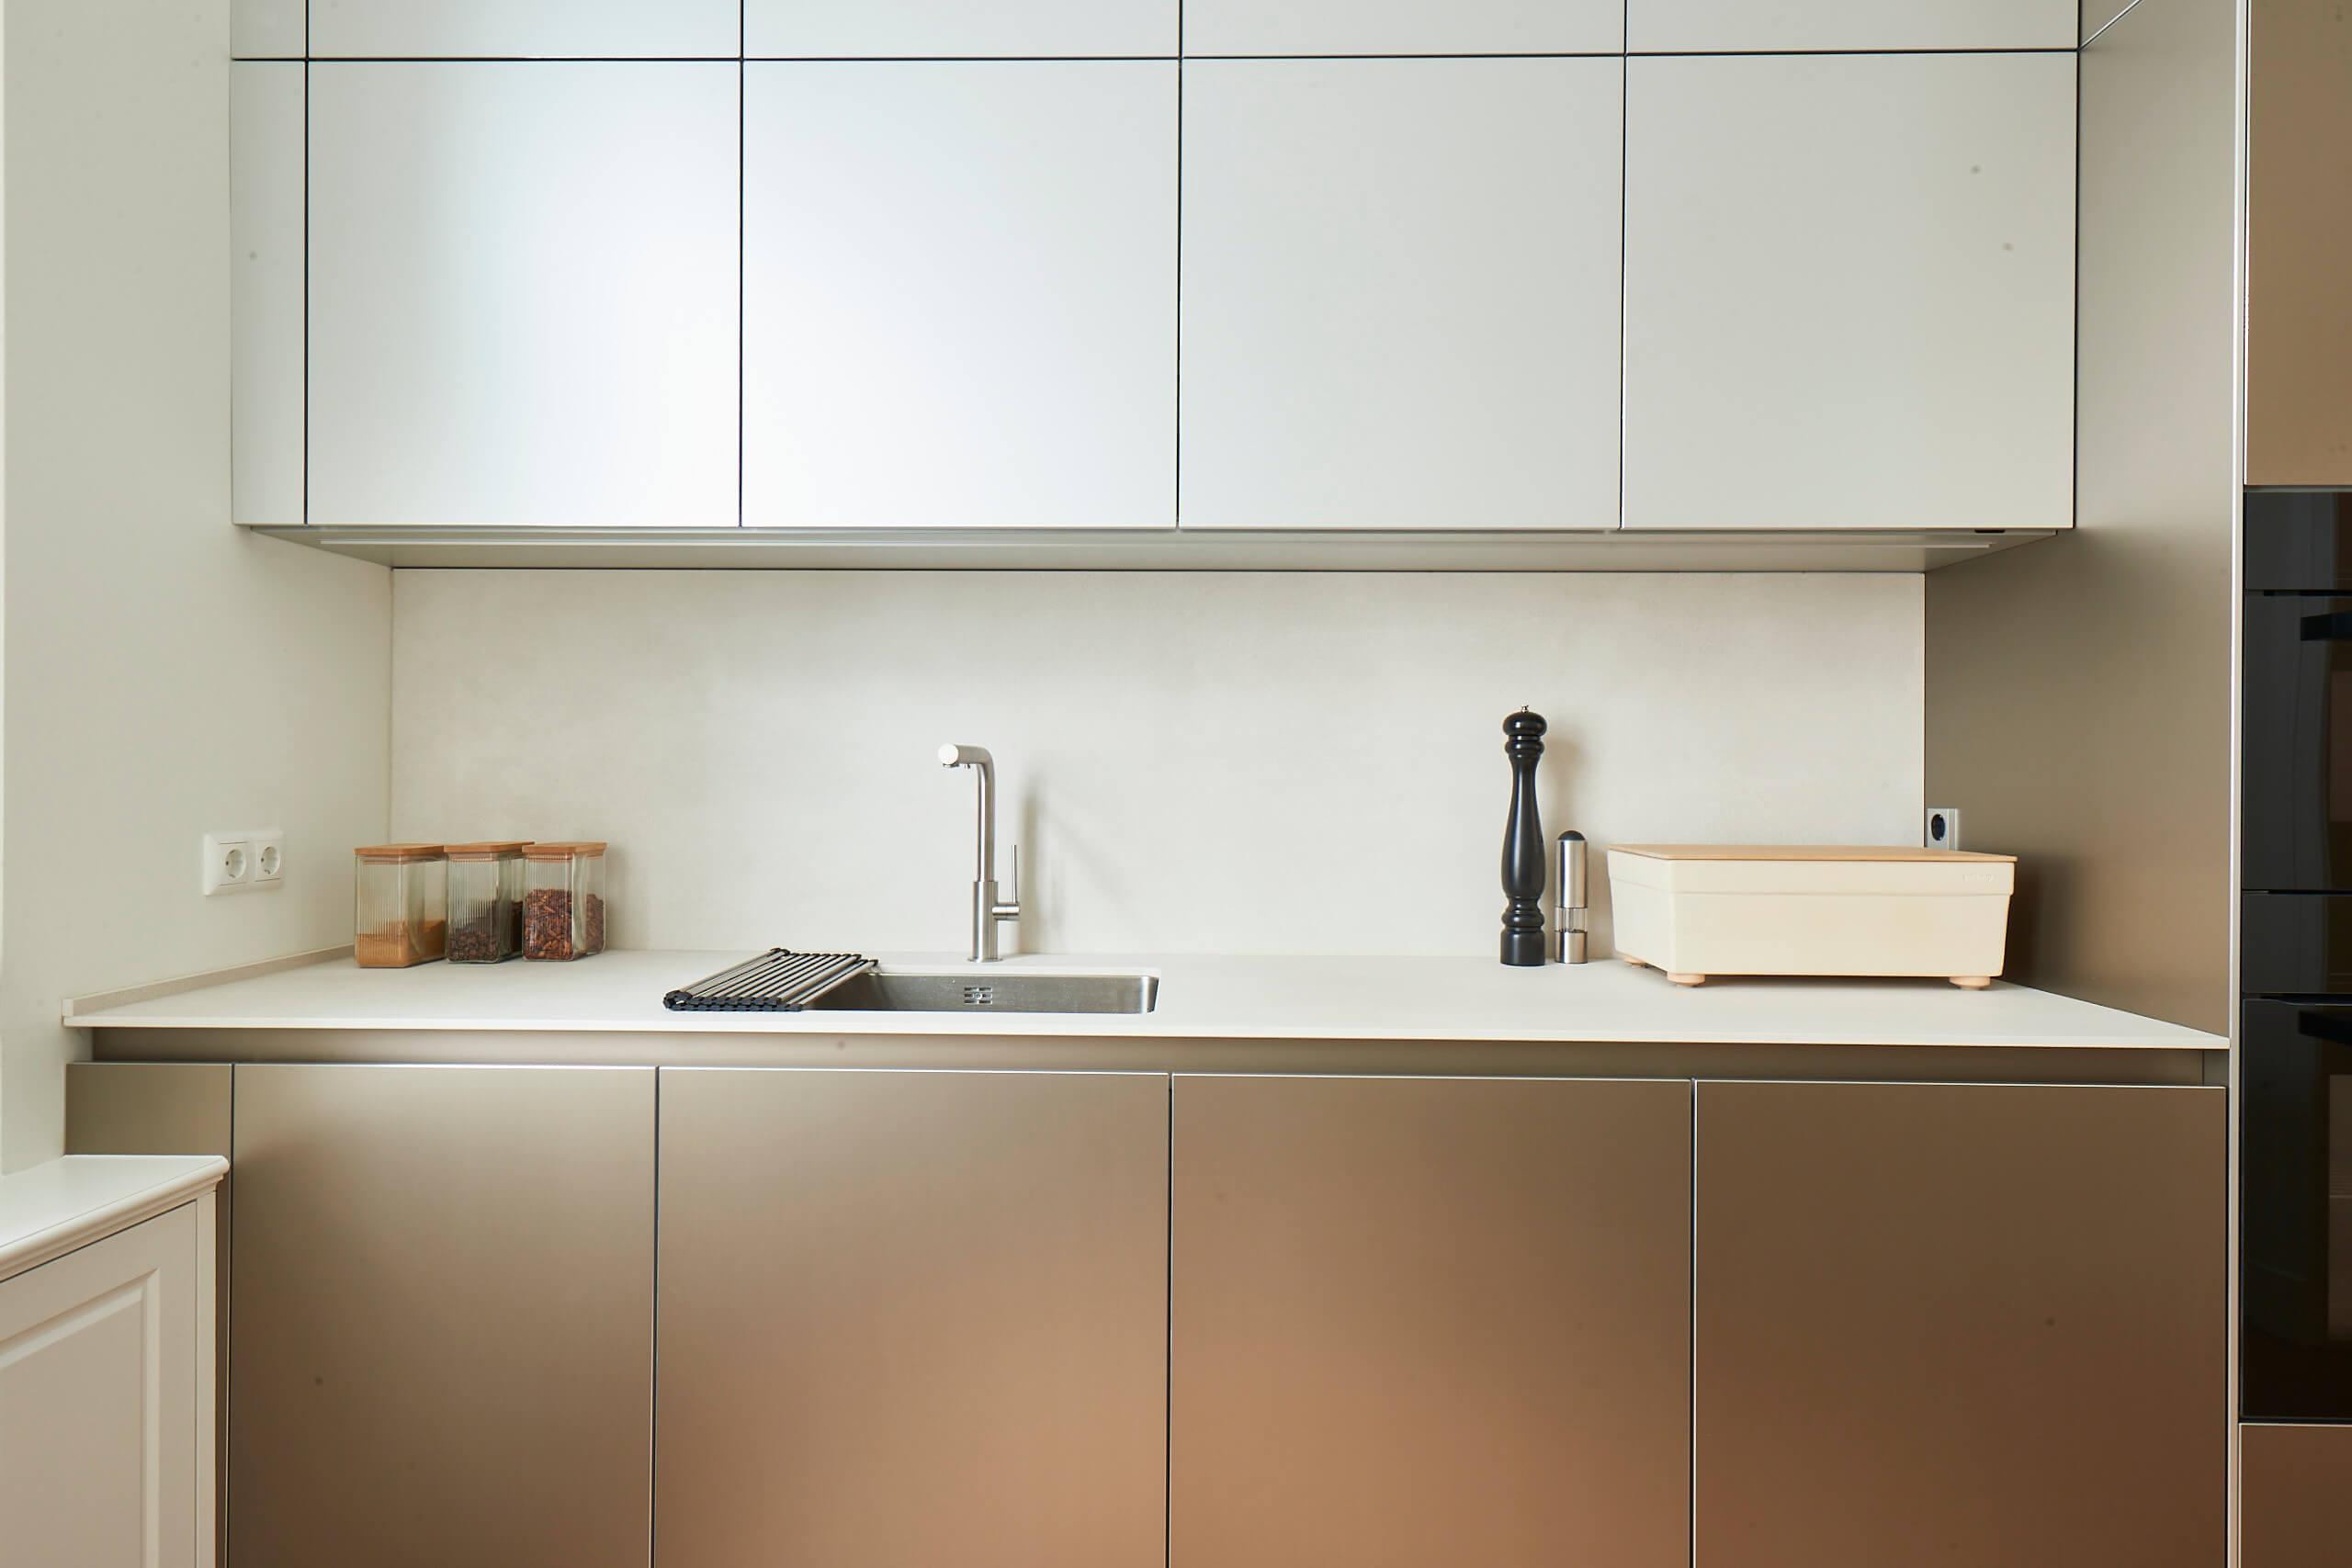 Küchen Atelier Hamburg - Bulthaup b3 in Uhlenhorst